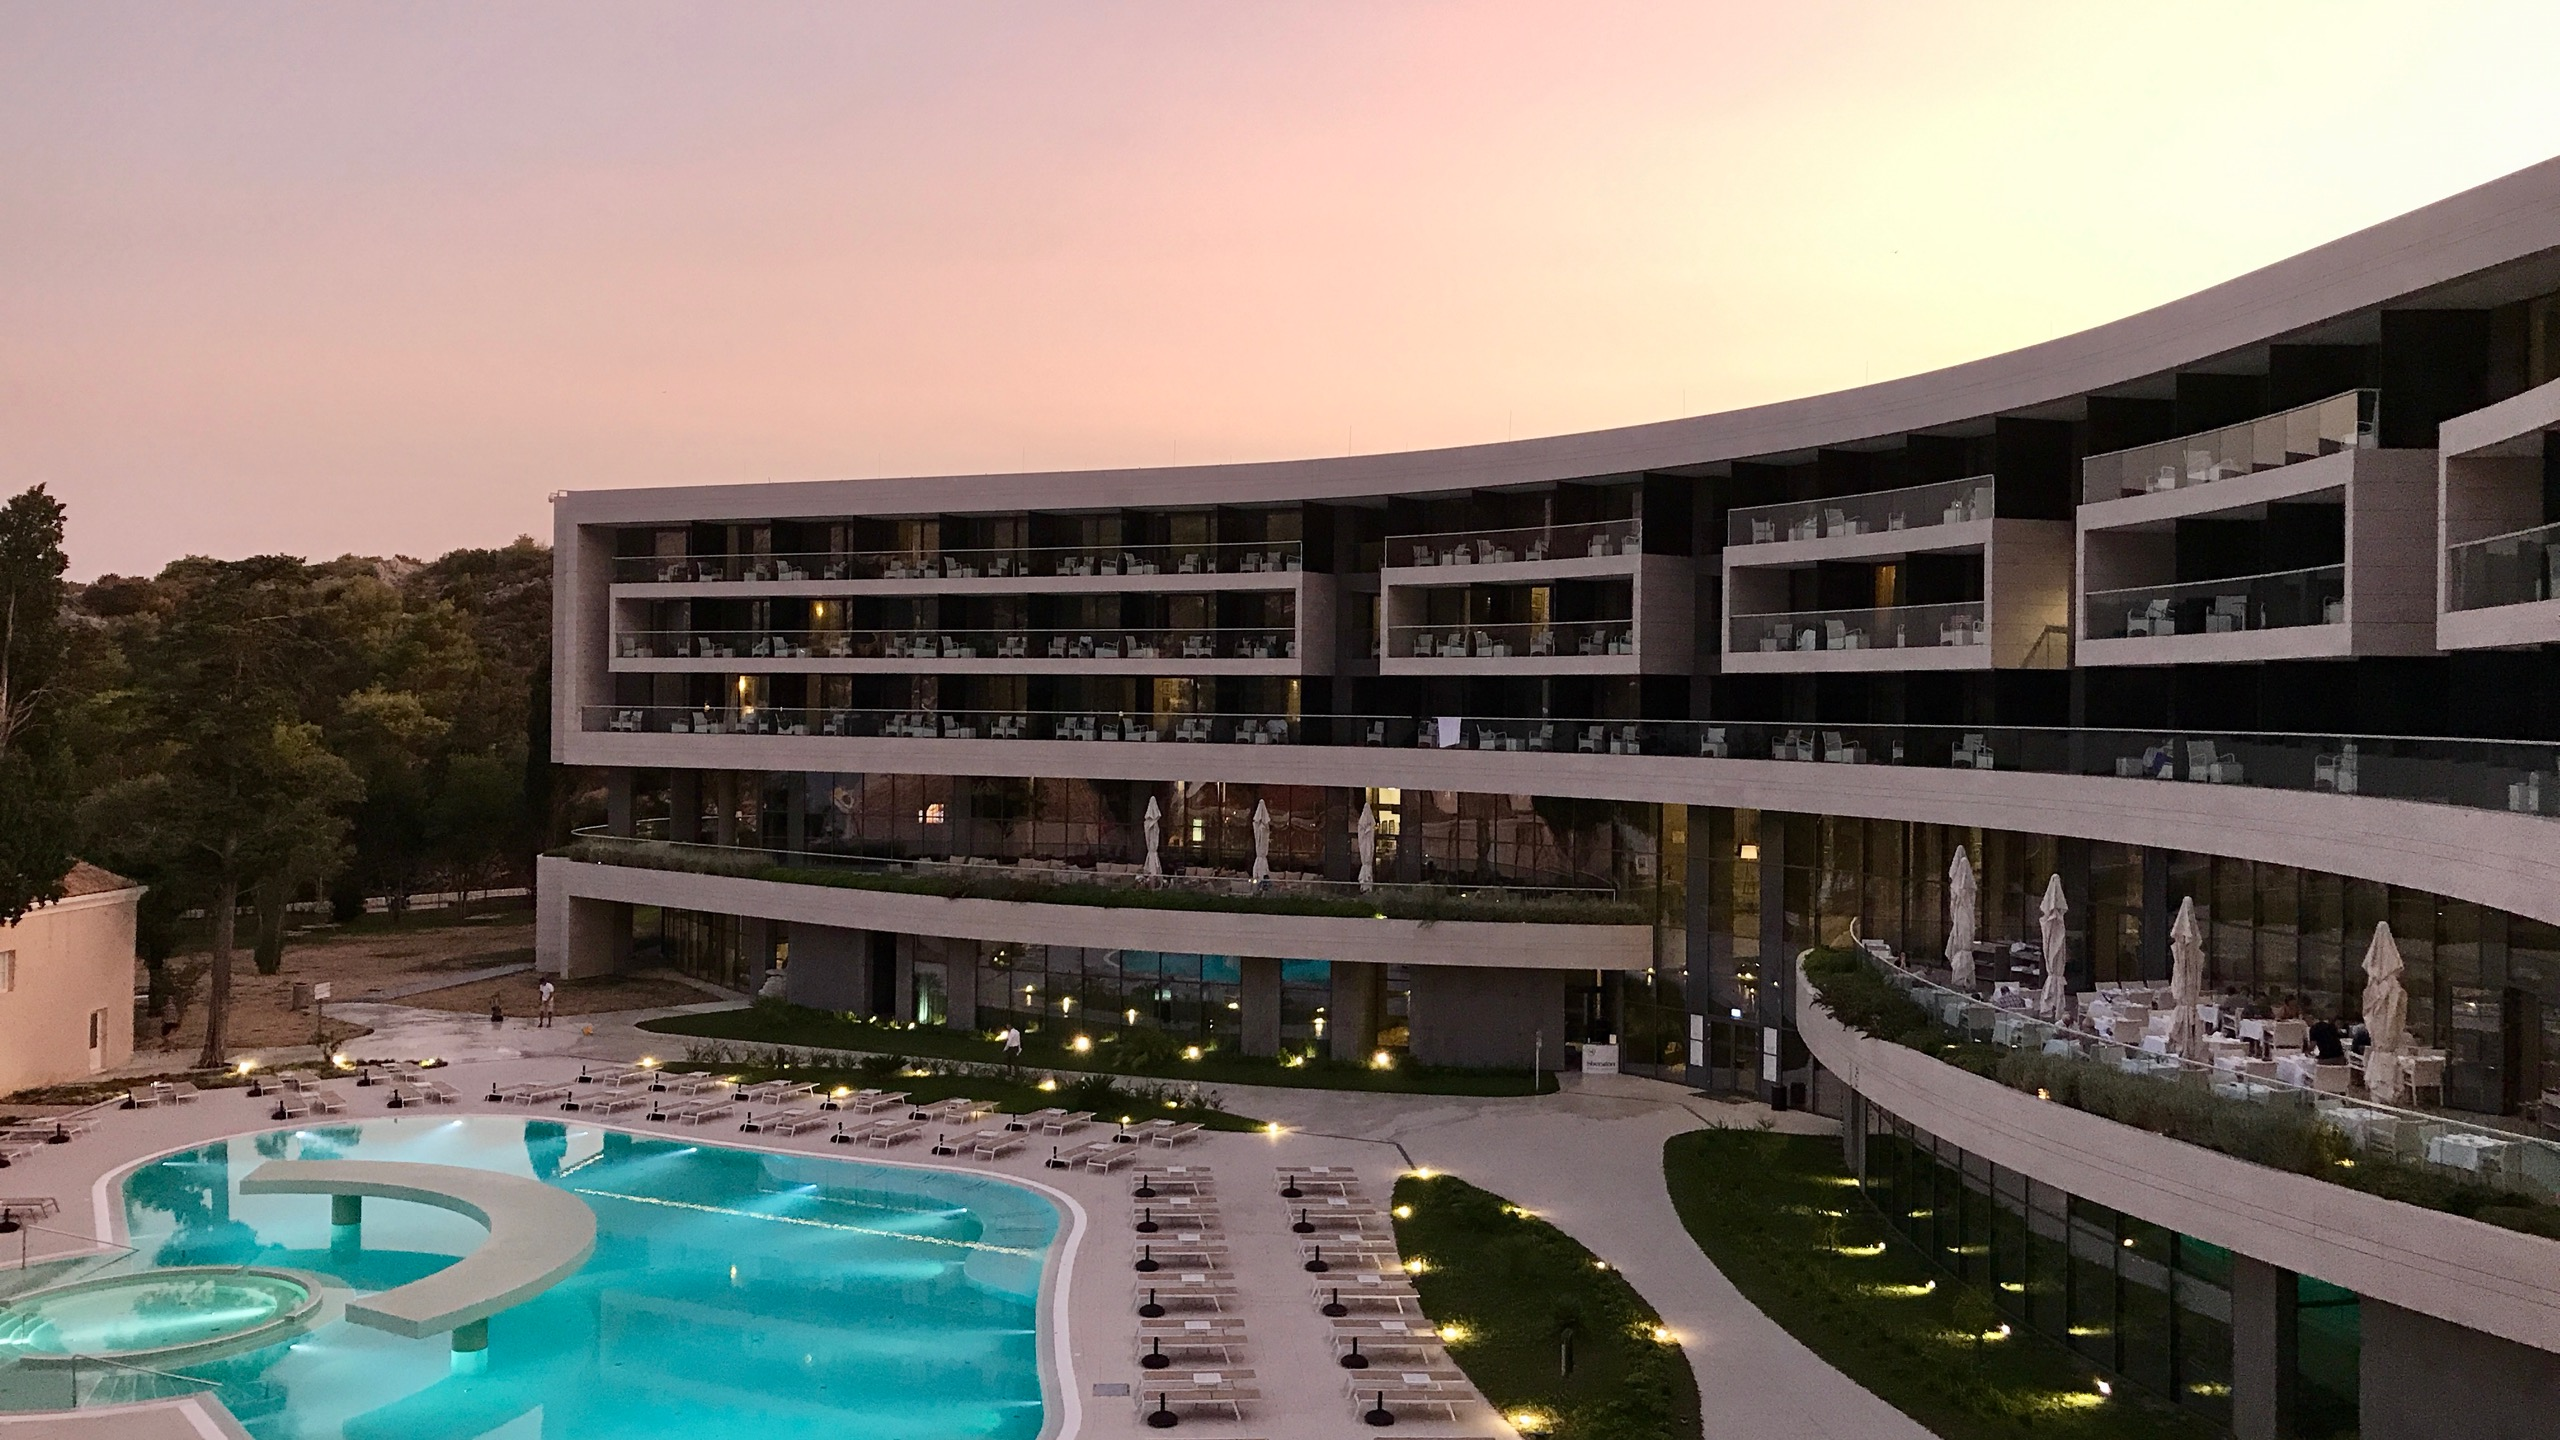 Dubrovnik Sheraton Hotel im rotgelben Sonnenuntergang, Pool ist türkis beleuchtet